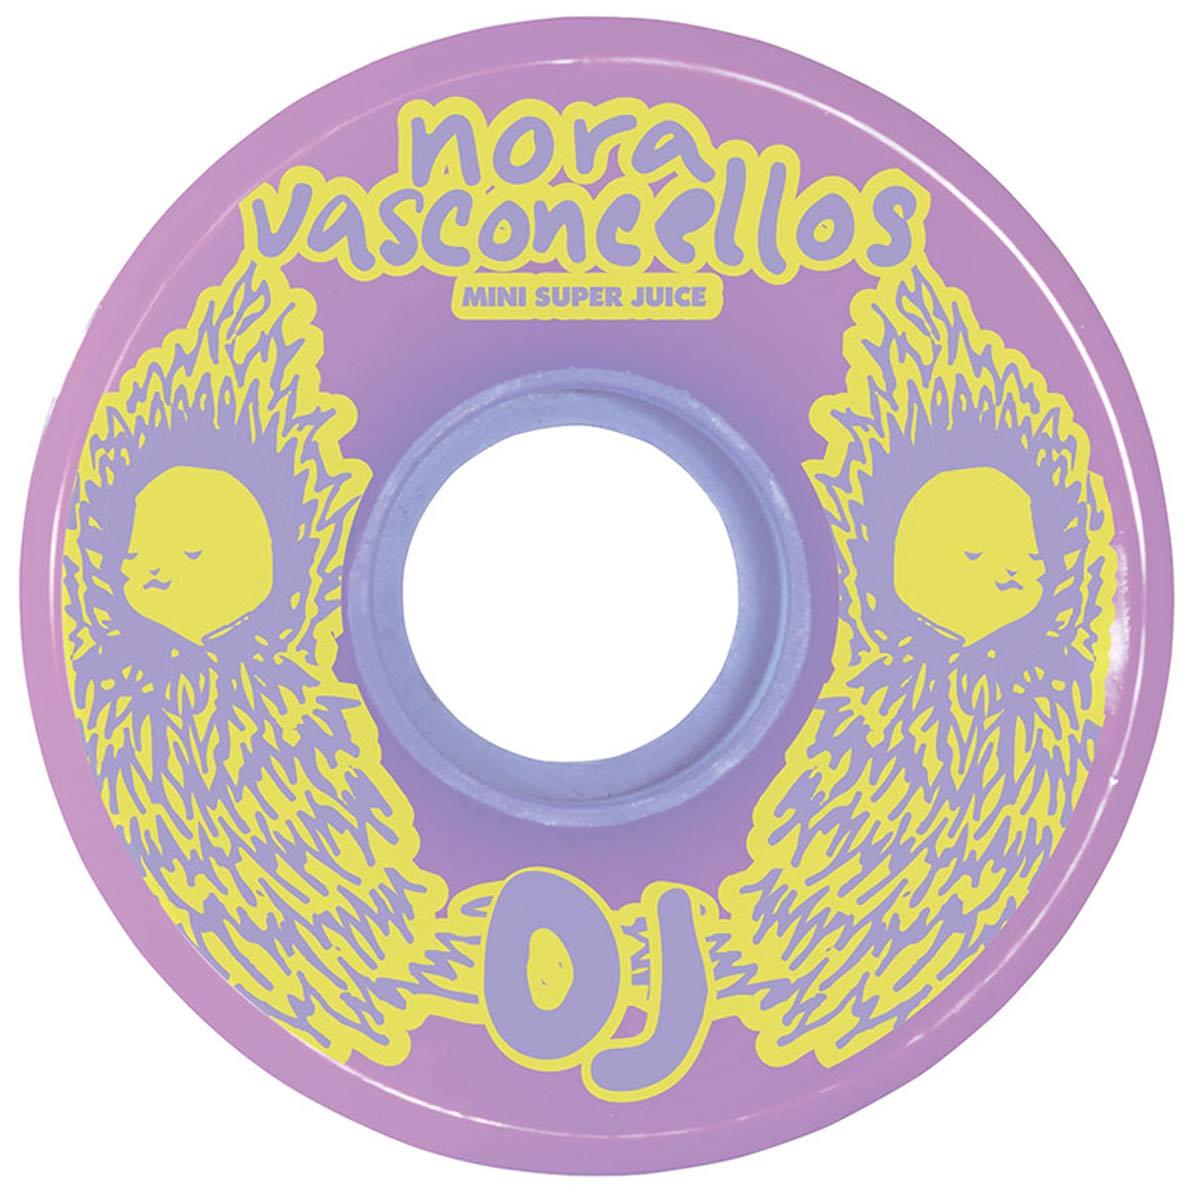 Oj Mini Super Juice Cruiser Skateboard Wheels Nora Vasconcellos Canada Online Sales Vancouver Pickup